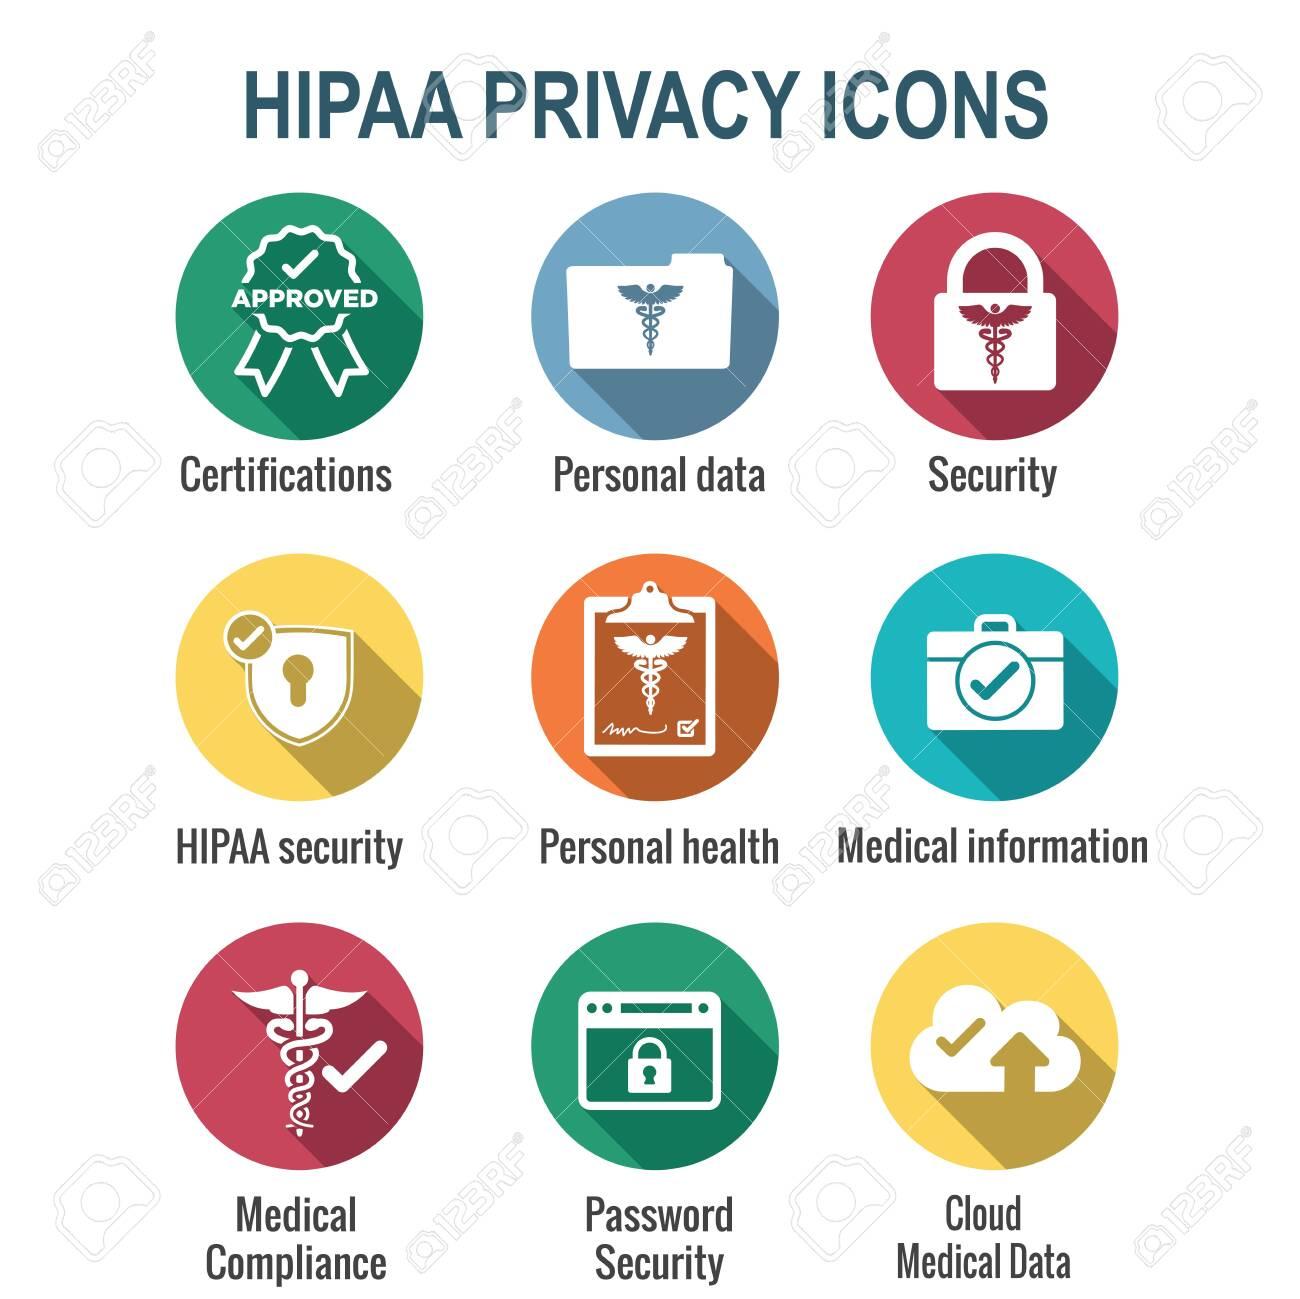 HIPAA Compliance icon set - hippa image involving medical privacy - 146706257